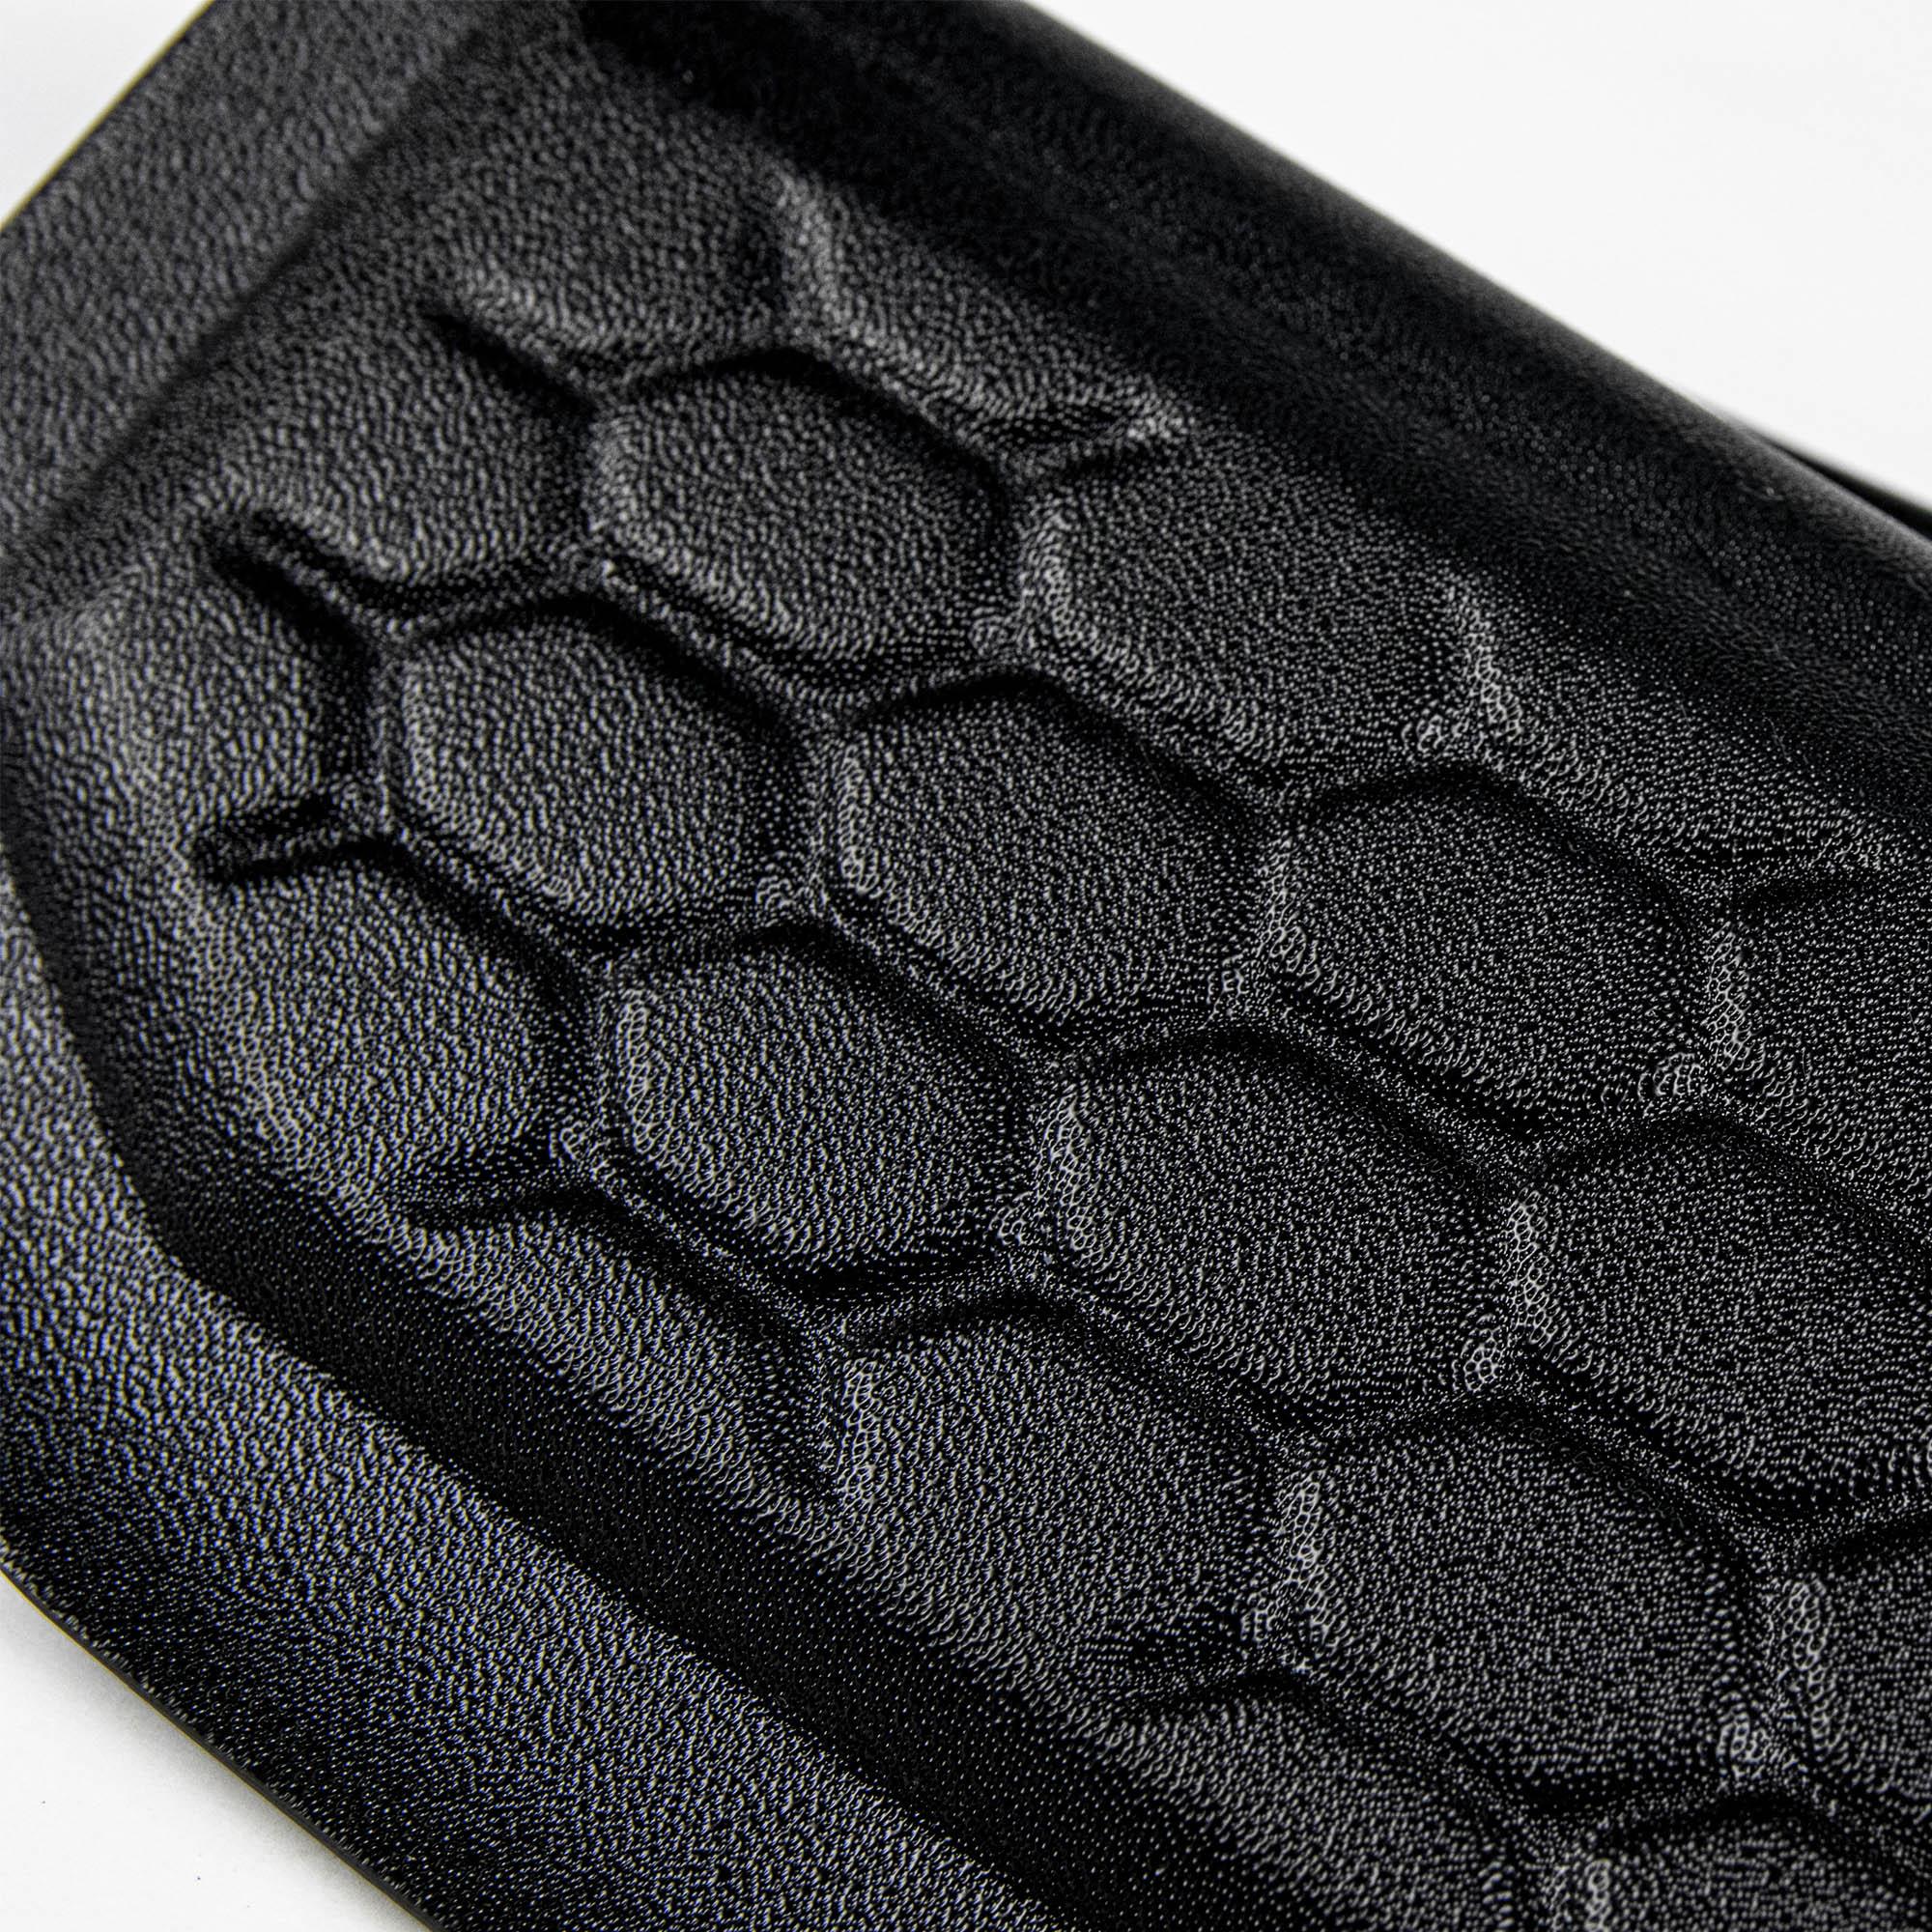 Накладка на ковролин под левую ногу водителя для Hyundai Solaris II; Kia Rio 4, X2